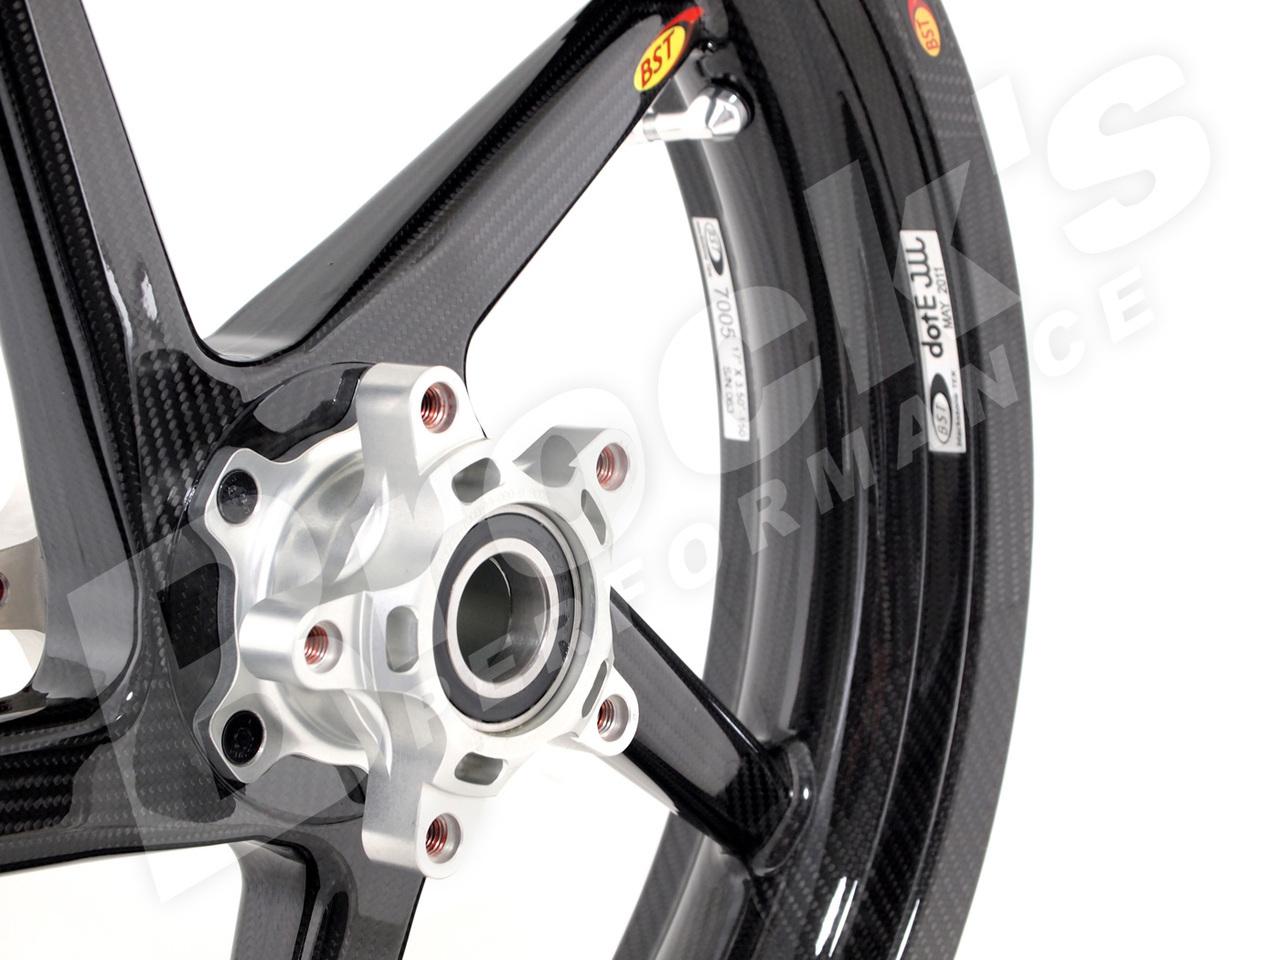 BST Diamond TEK 17 x 3.5 R+ Series Front Wheel - Suzuki GSX-R1000 (01-04) / GSX-R750 (00-05) / GSX-R600 (04-05)